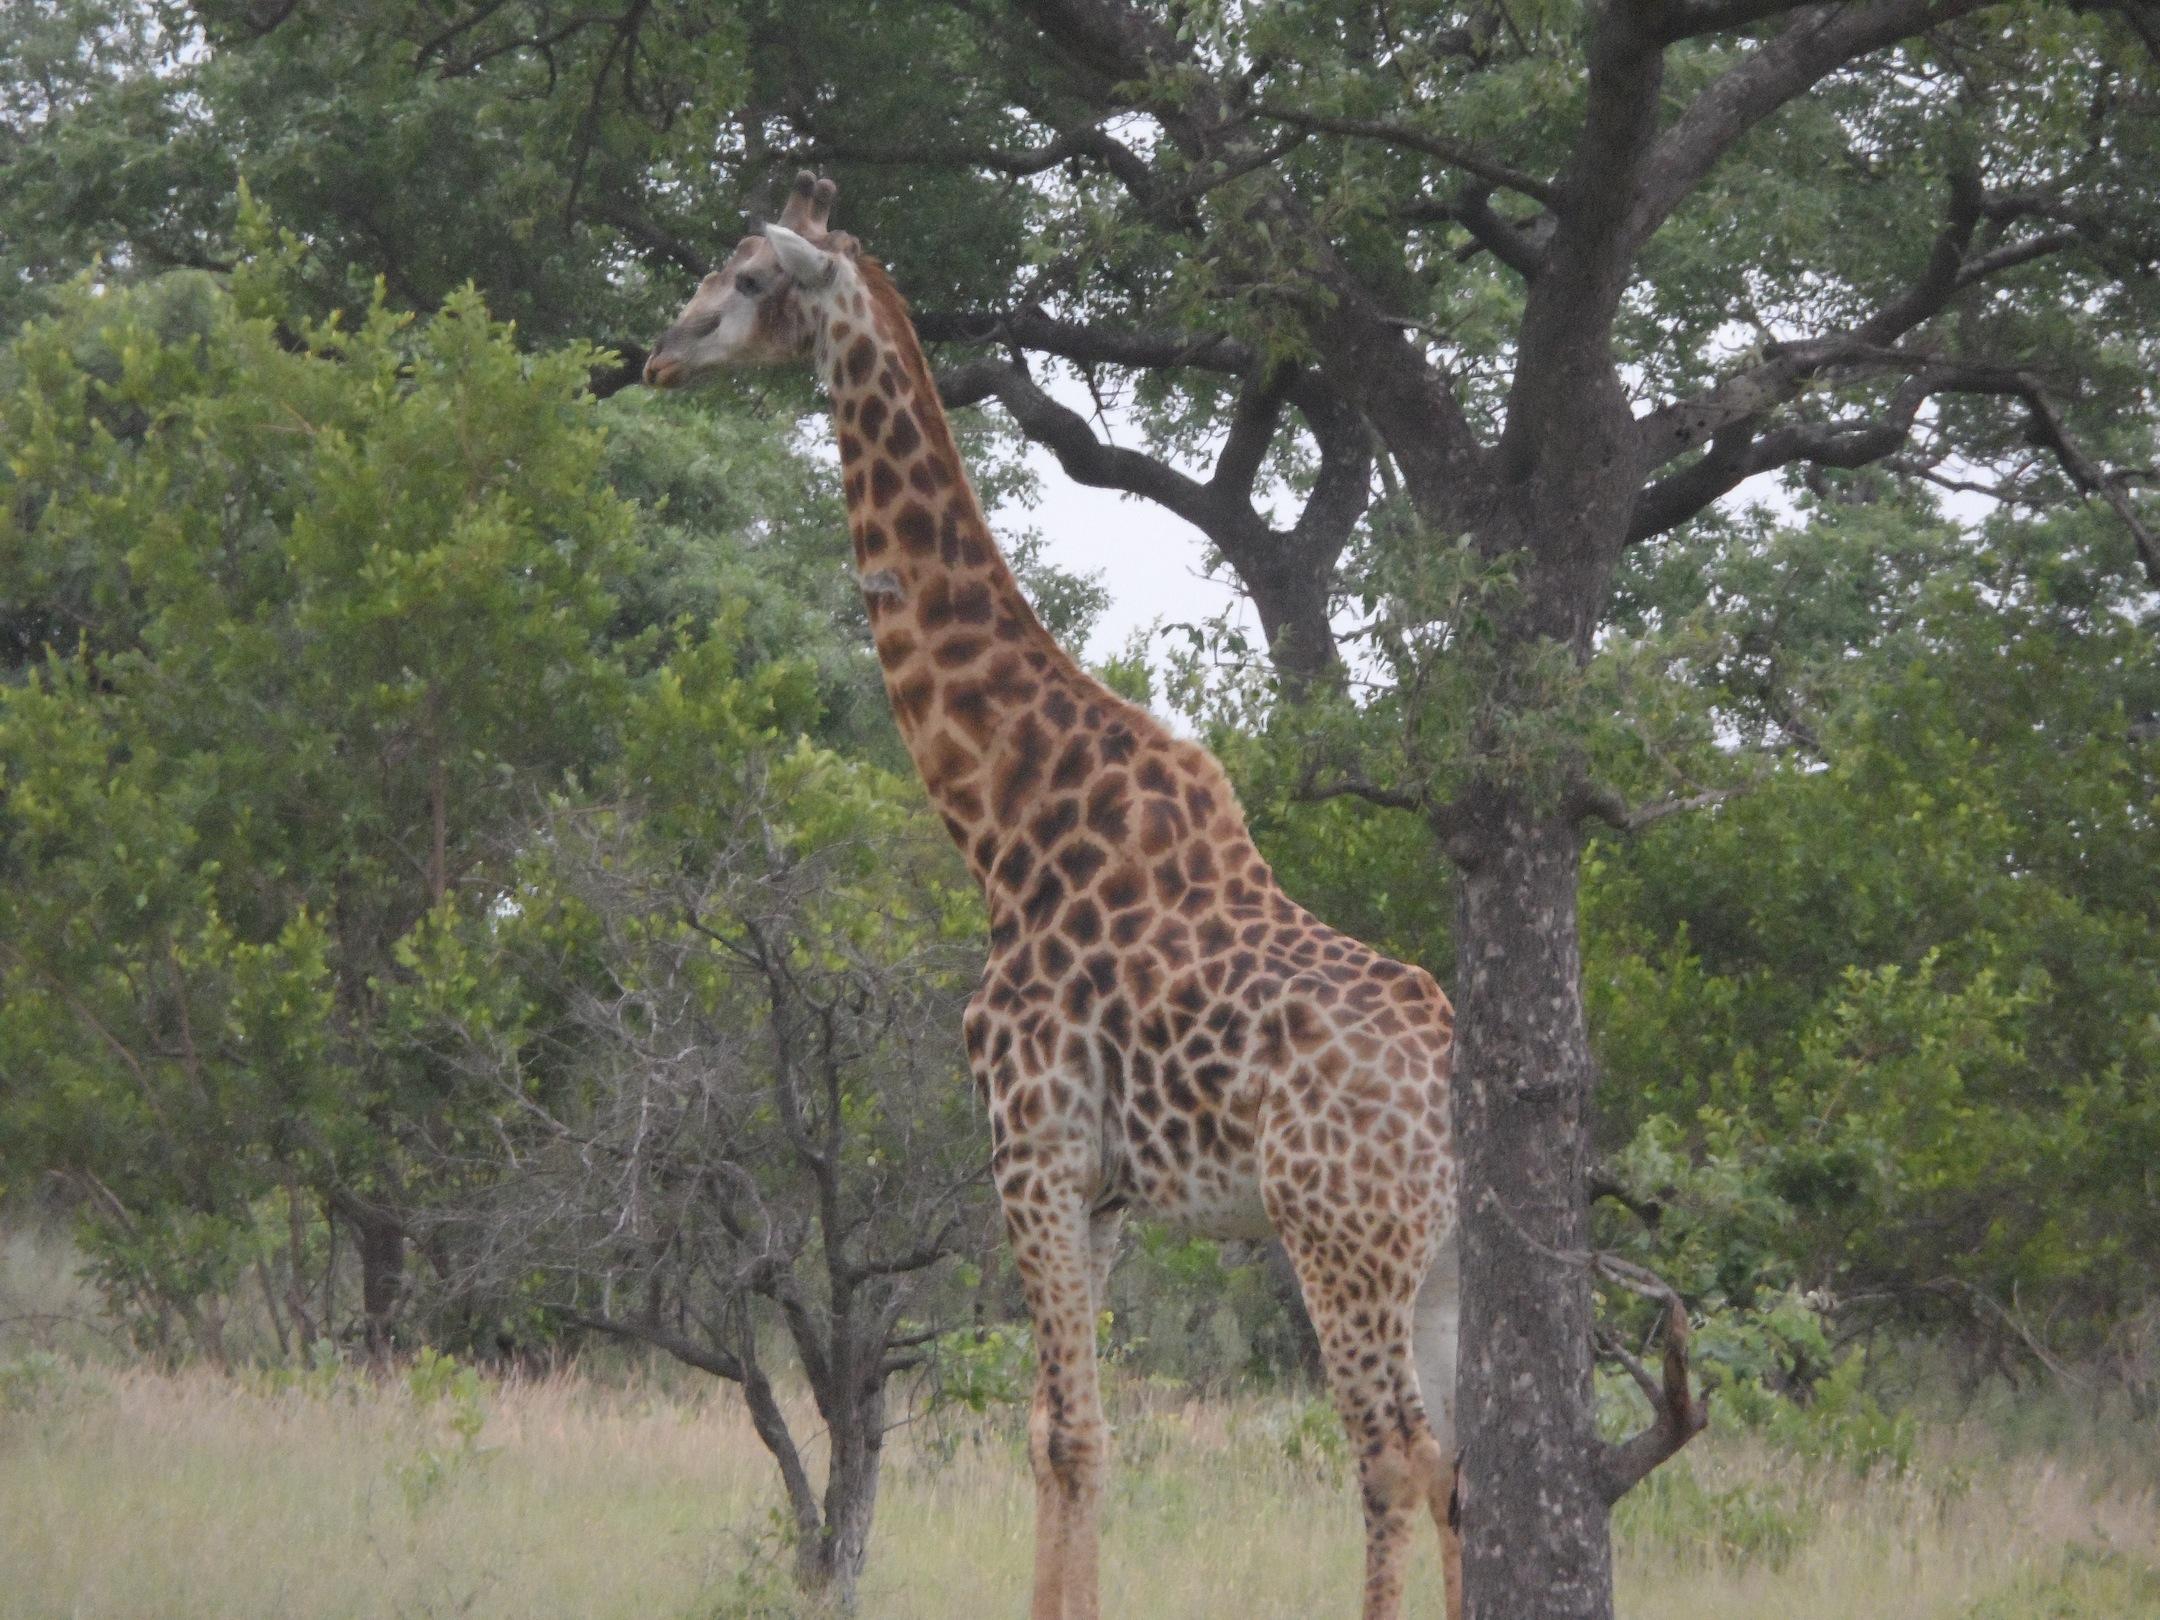 2013-01-29-Giraffebyhislonesome.JPG